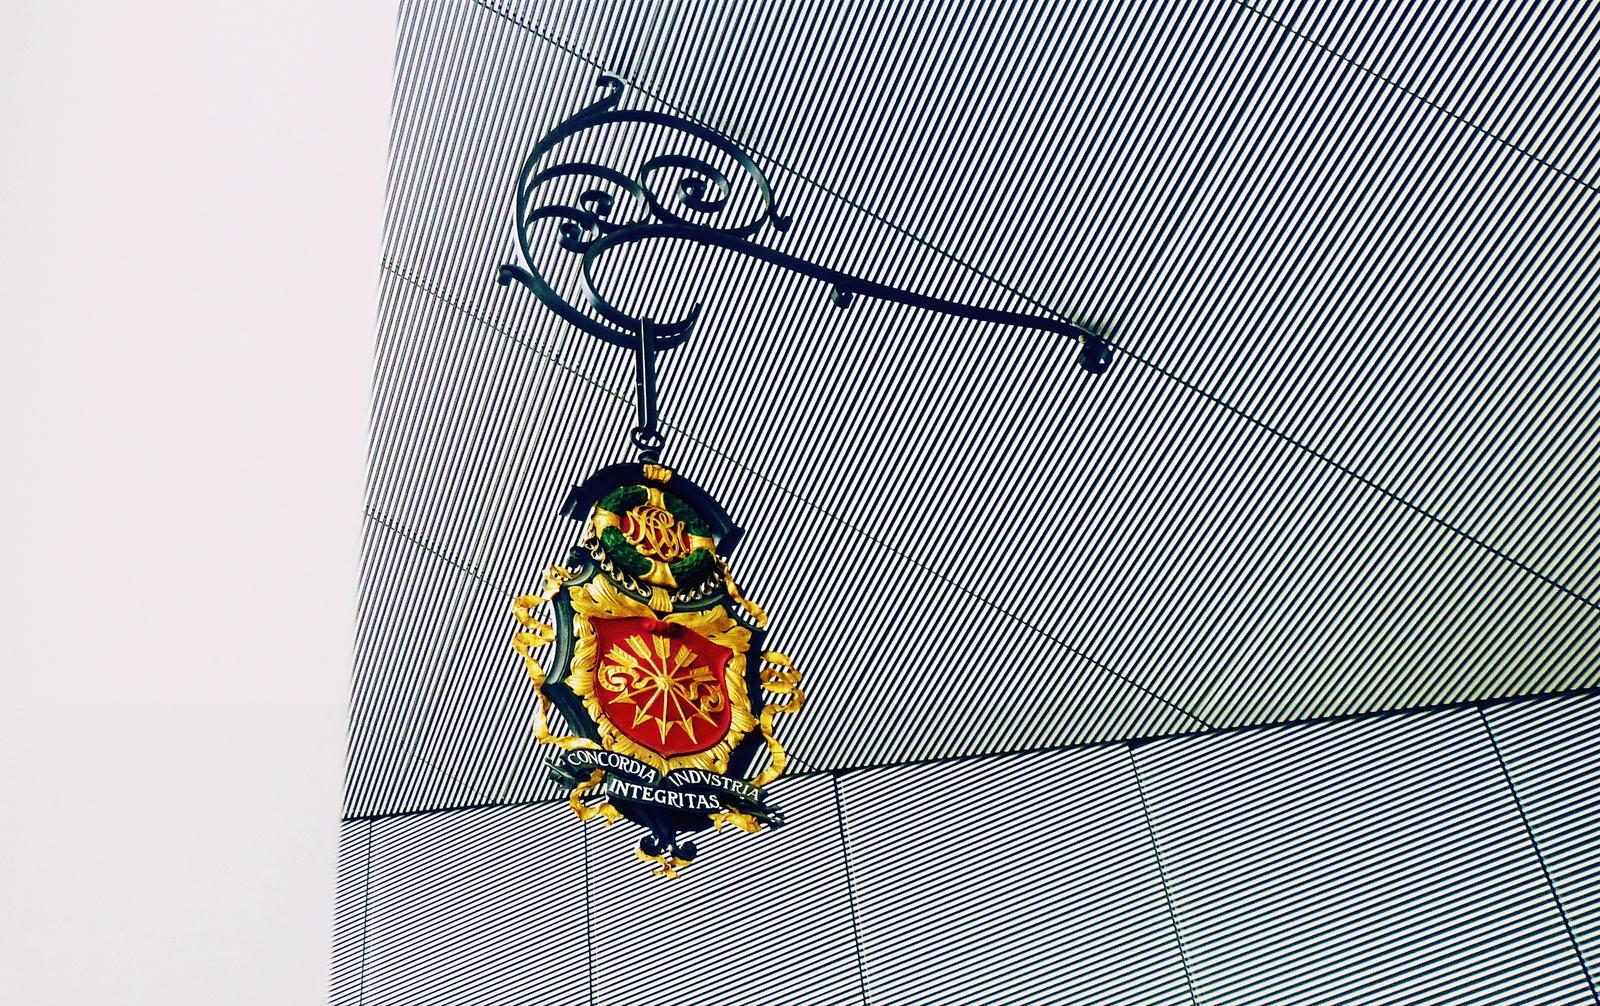 Rothschild Crest (London HQ)